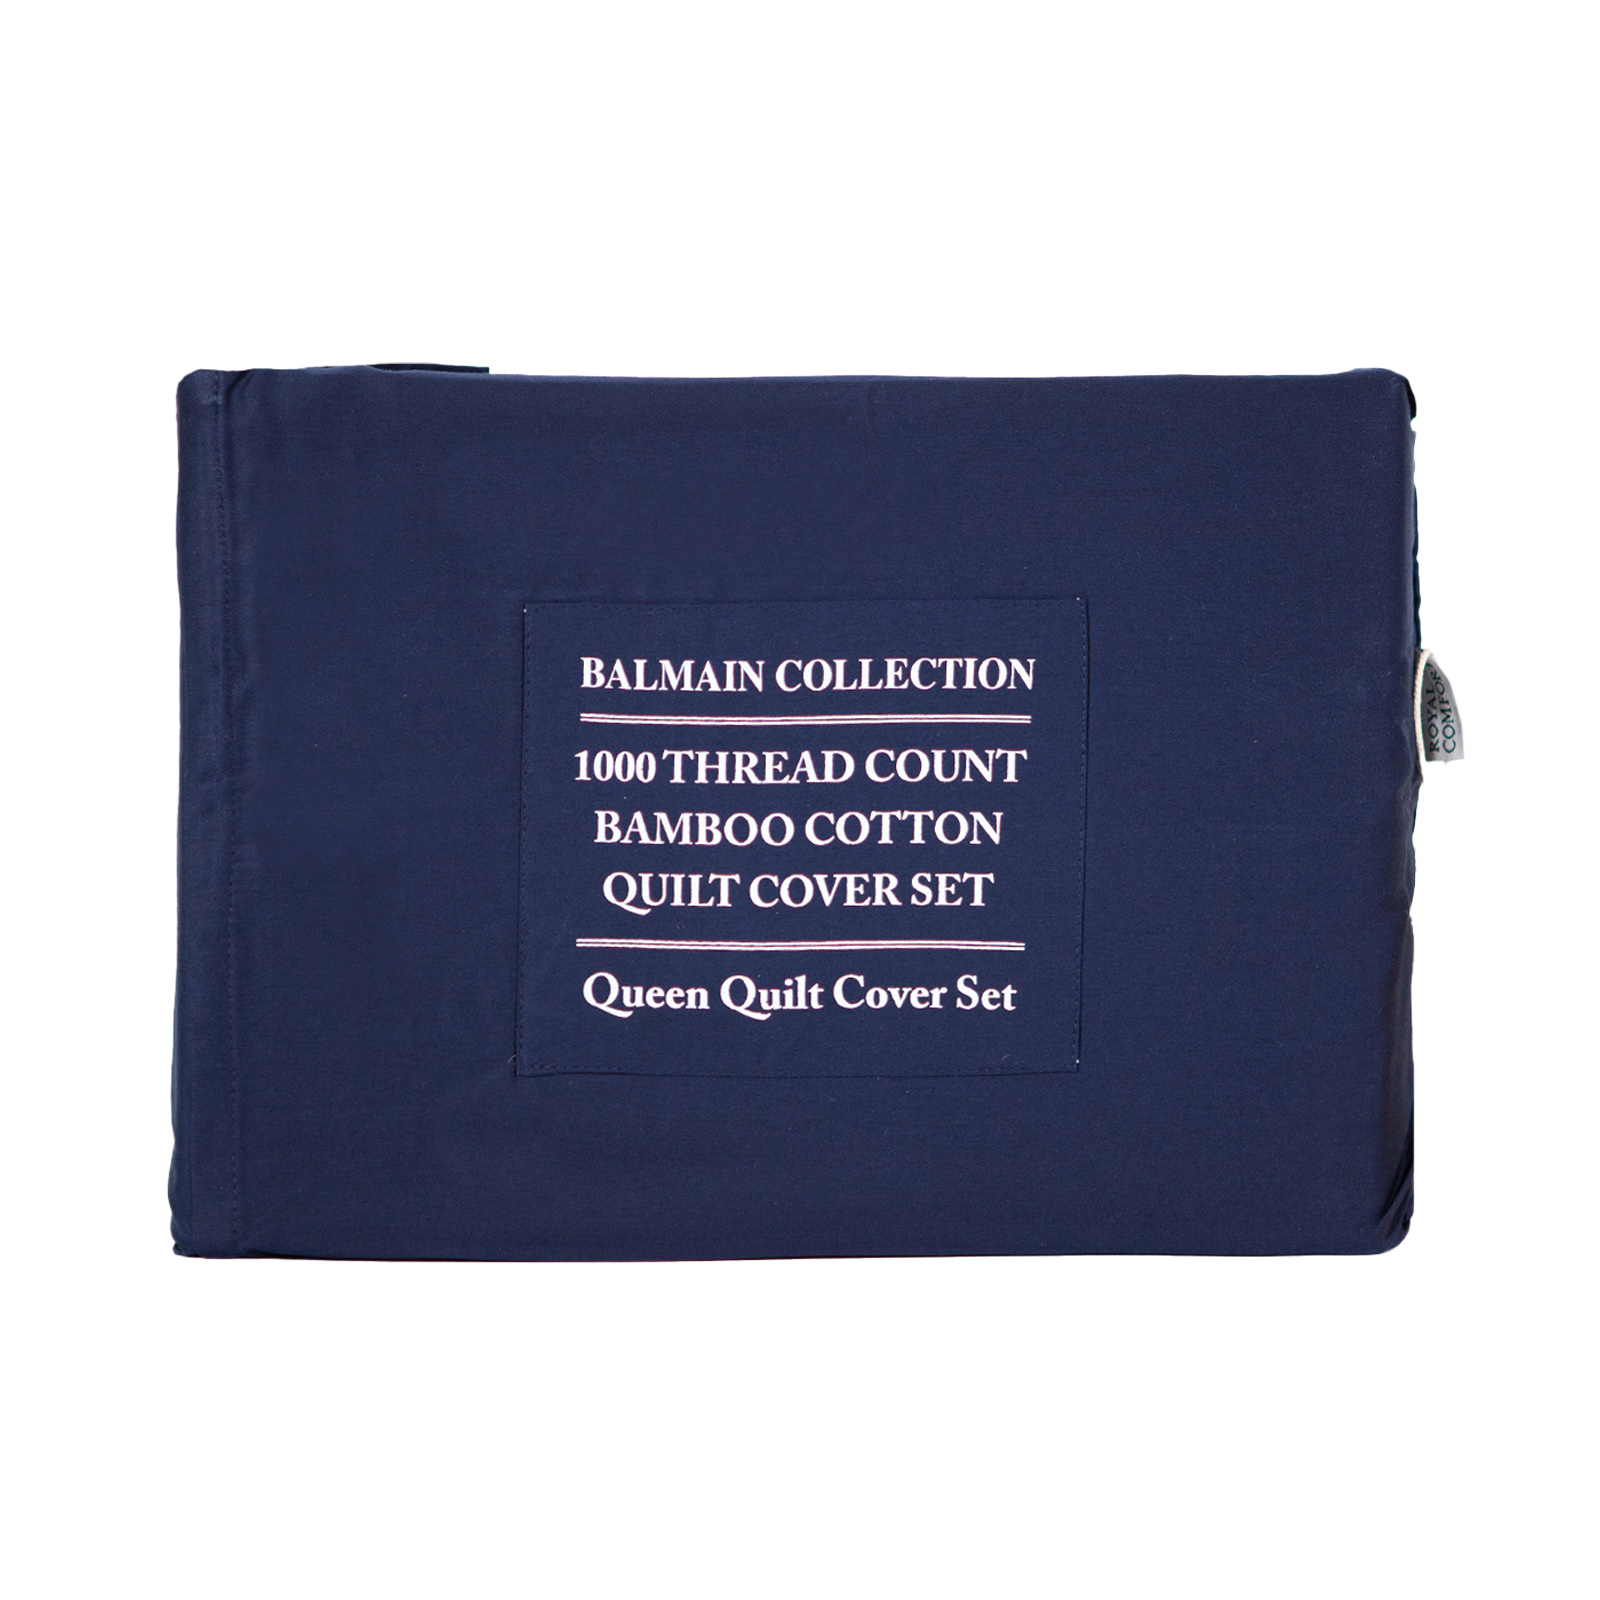 thumbnail 68 - Royal Comfort 1000TC Hotel Grade Bamboo Cotton Sheets Pillowcases Set Ultrasoft